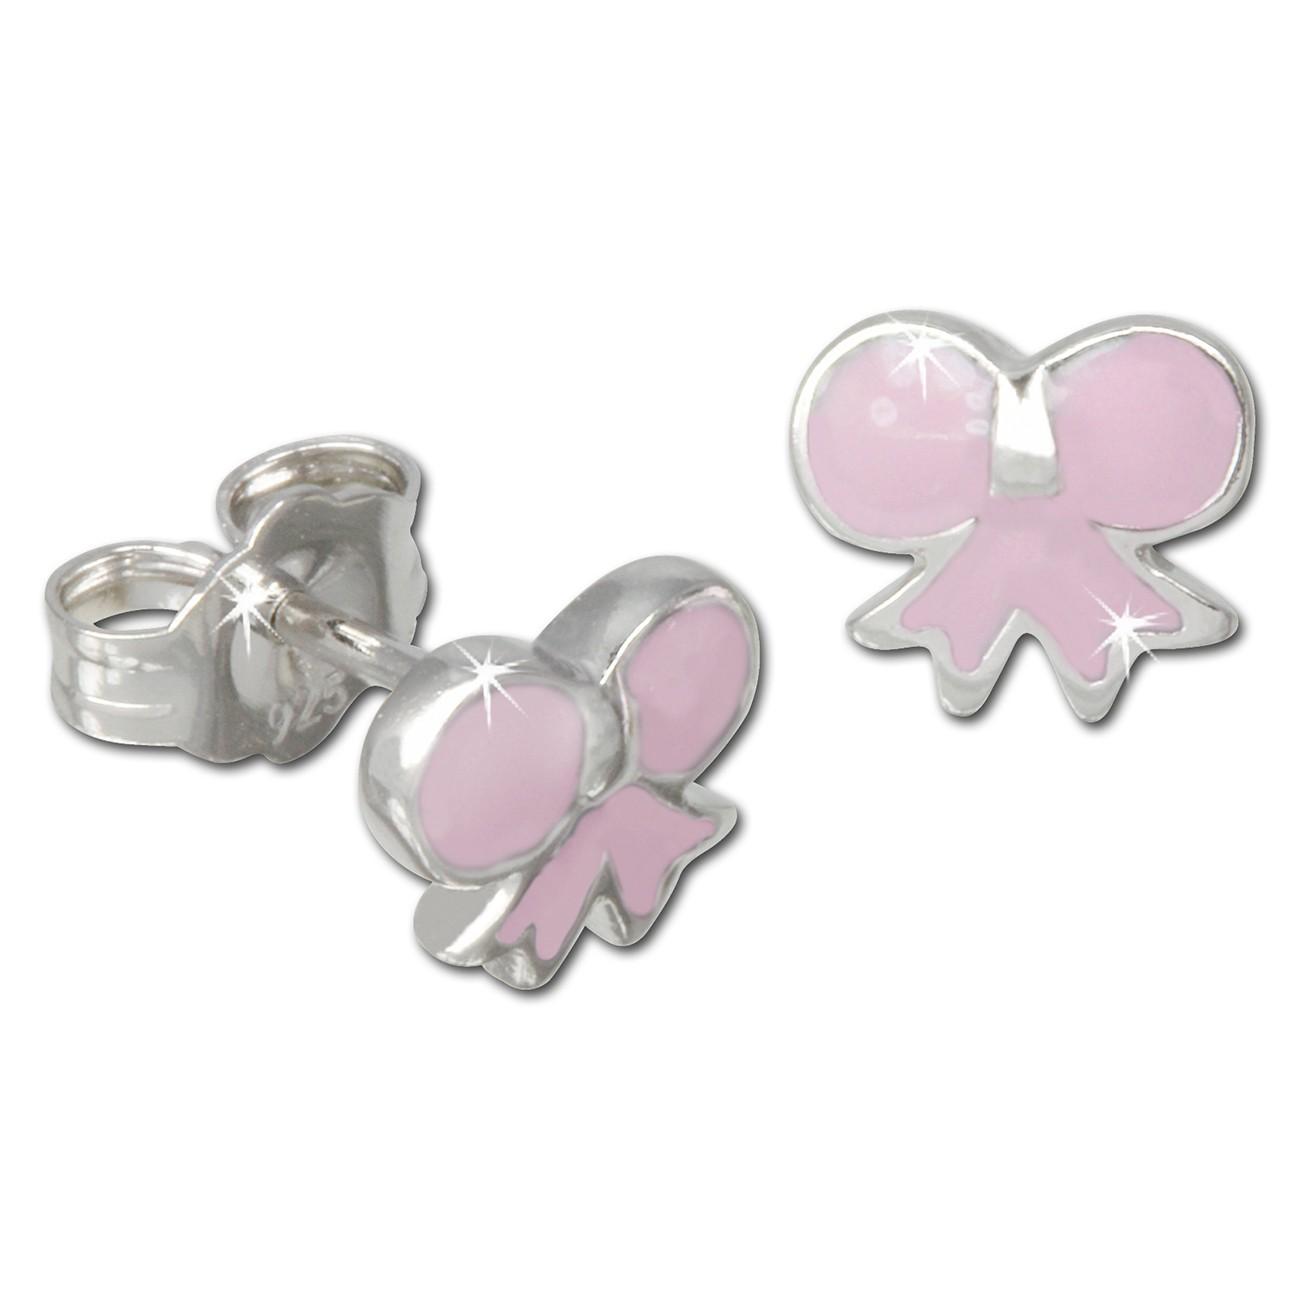 Kinder Ohrring Schleife rosa 925er Ohrstecker Kinderschmuck TW SDO608A